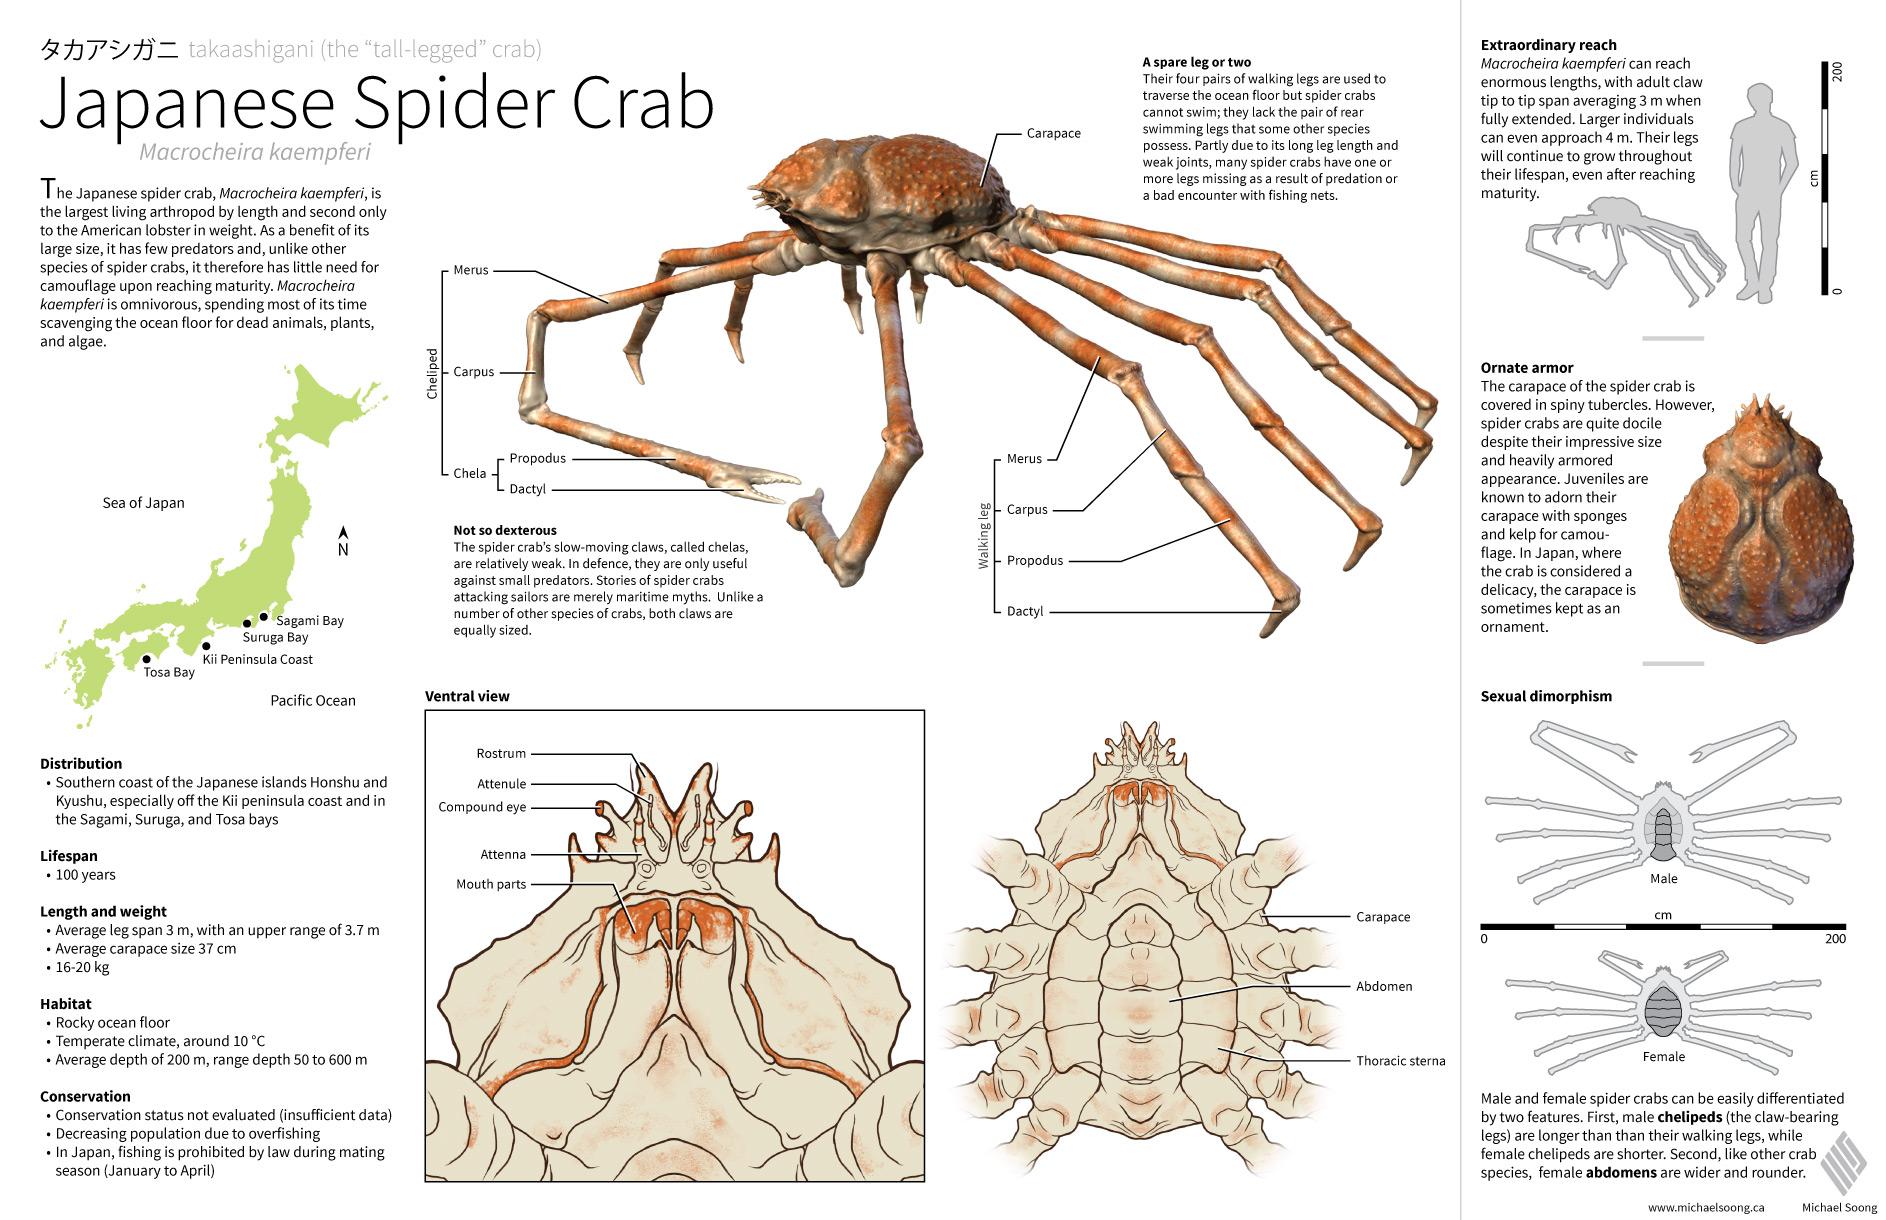 1990 alfa romeo spider wiring diagram sea spider diagram michael soong - biomedical communicator #14